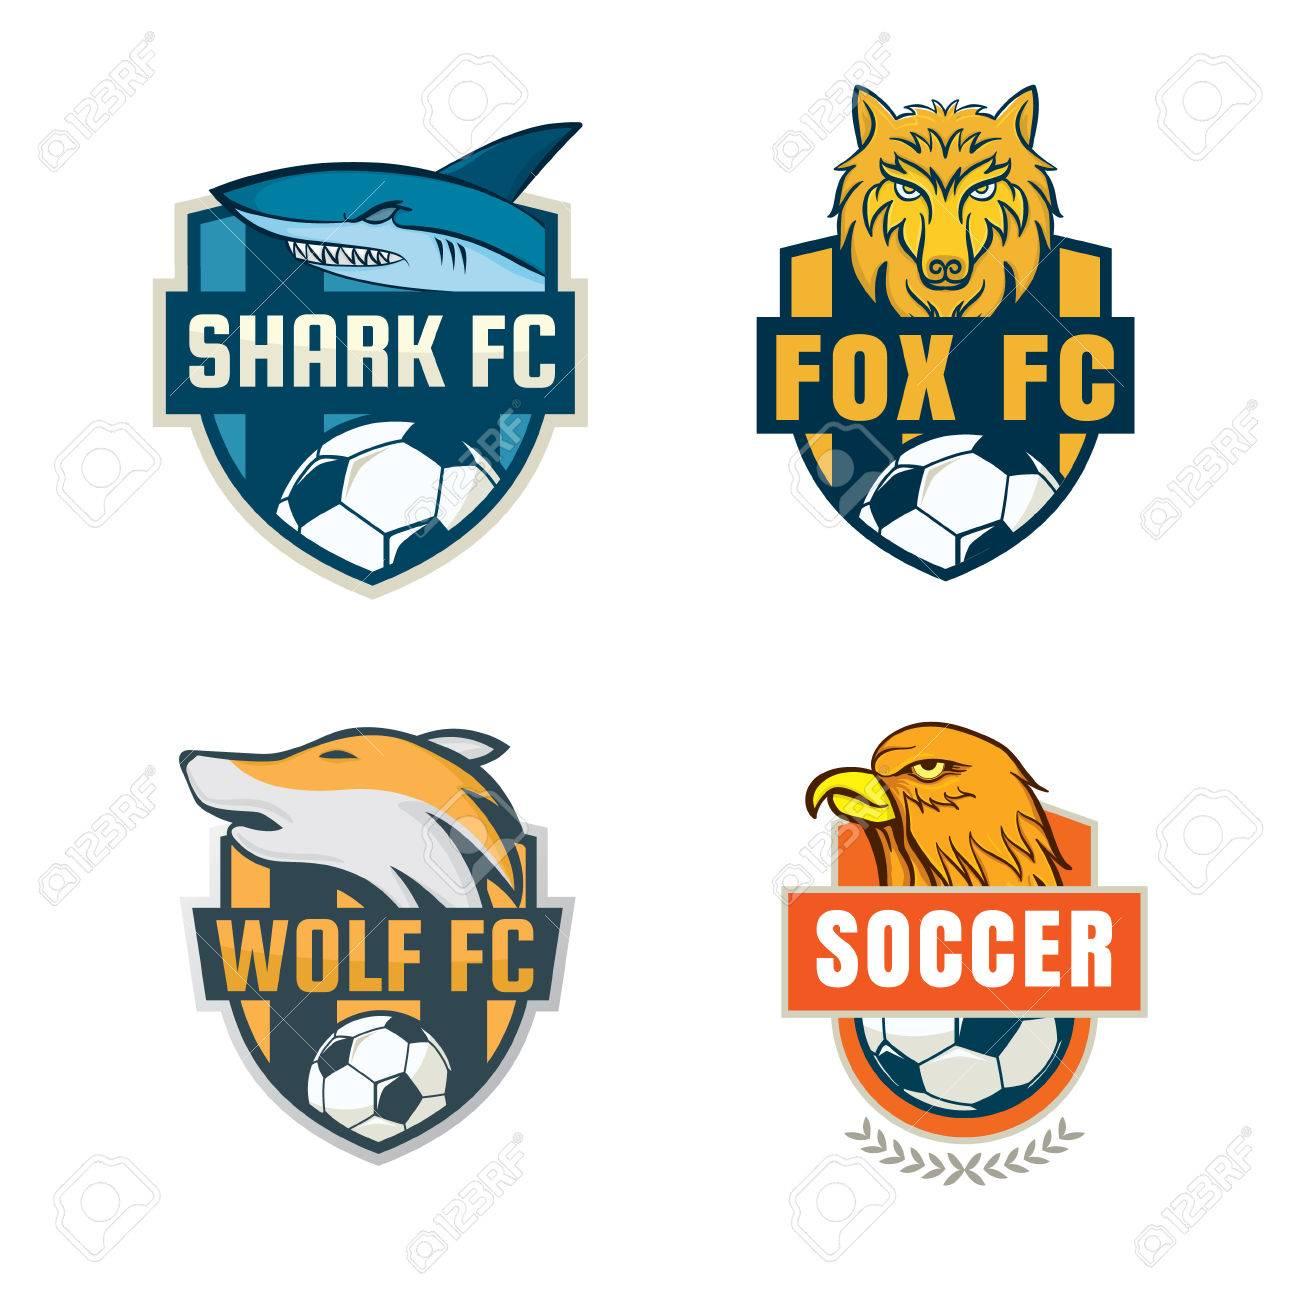 football badge logo template collection design,soccer team,vector illuatration - 61266098